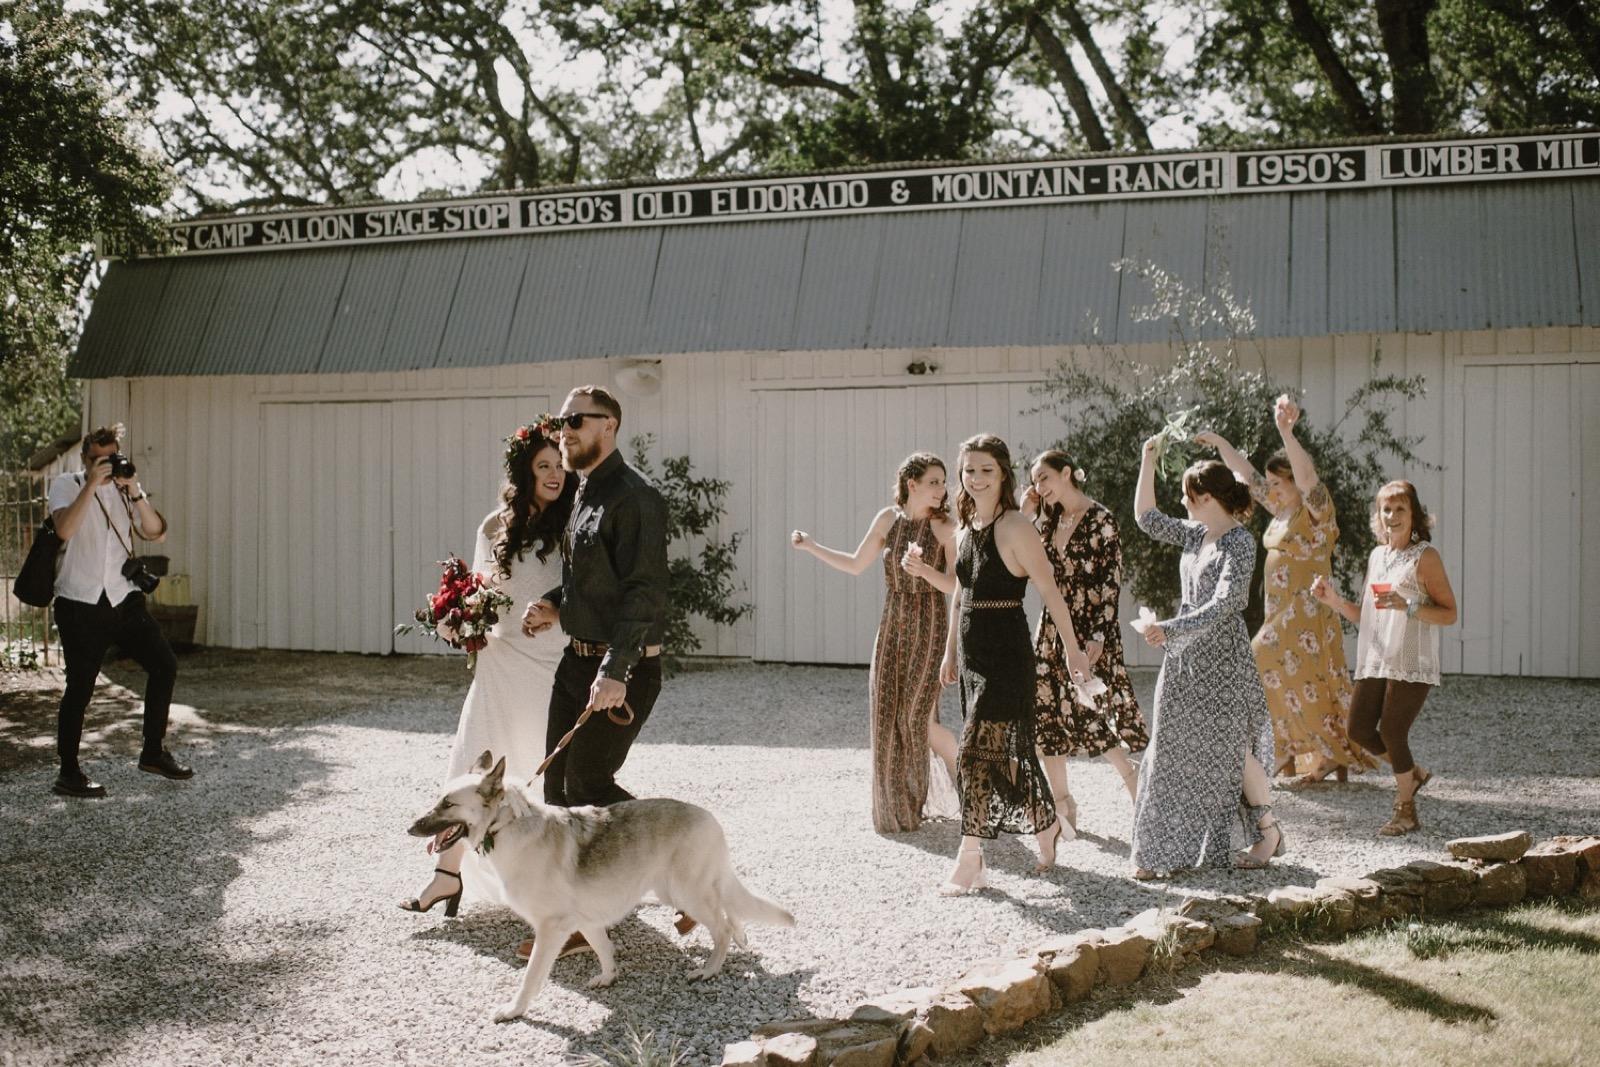 064_California_Ranch_Wedding167.jpg